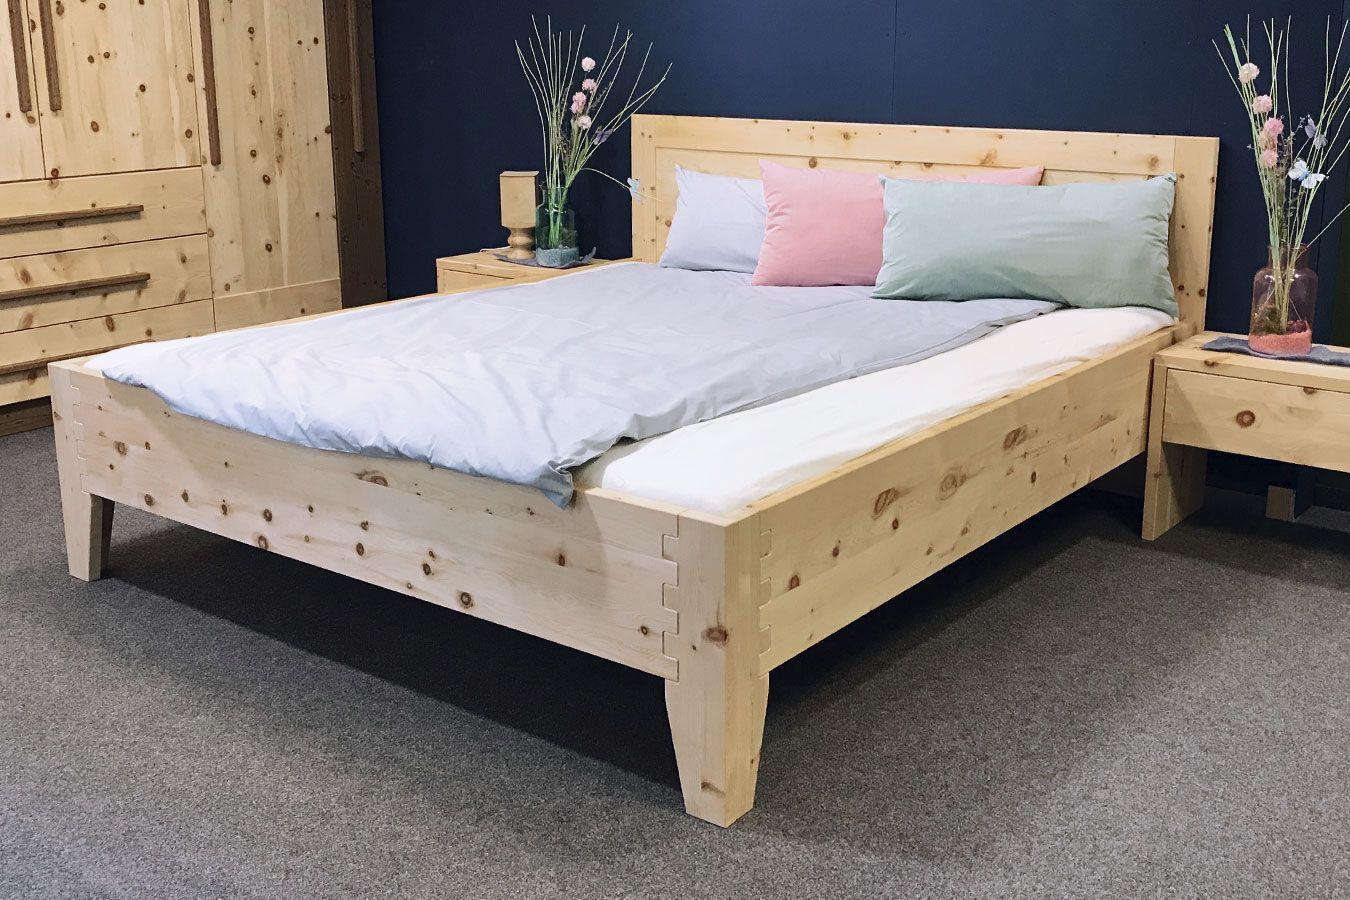 Metallfreies Bett aus Zirbenholz Original